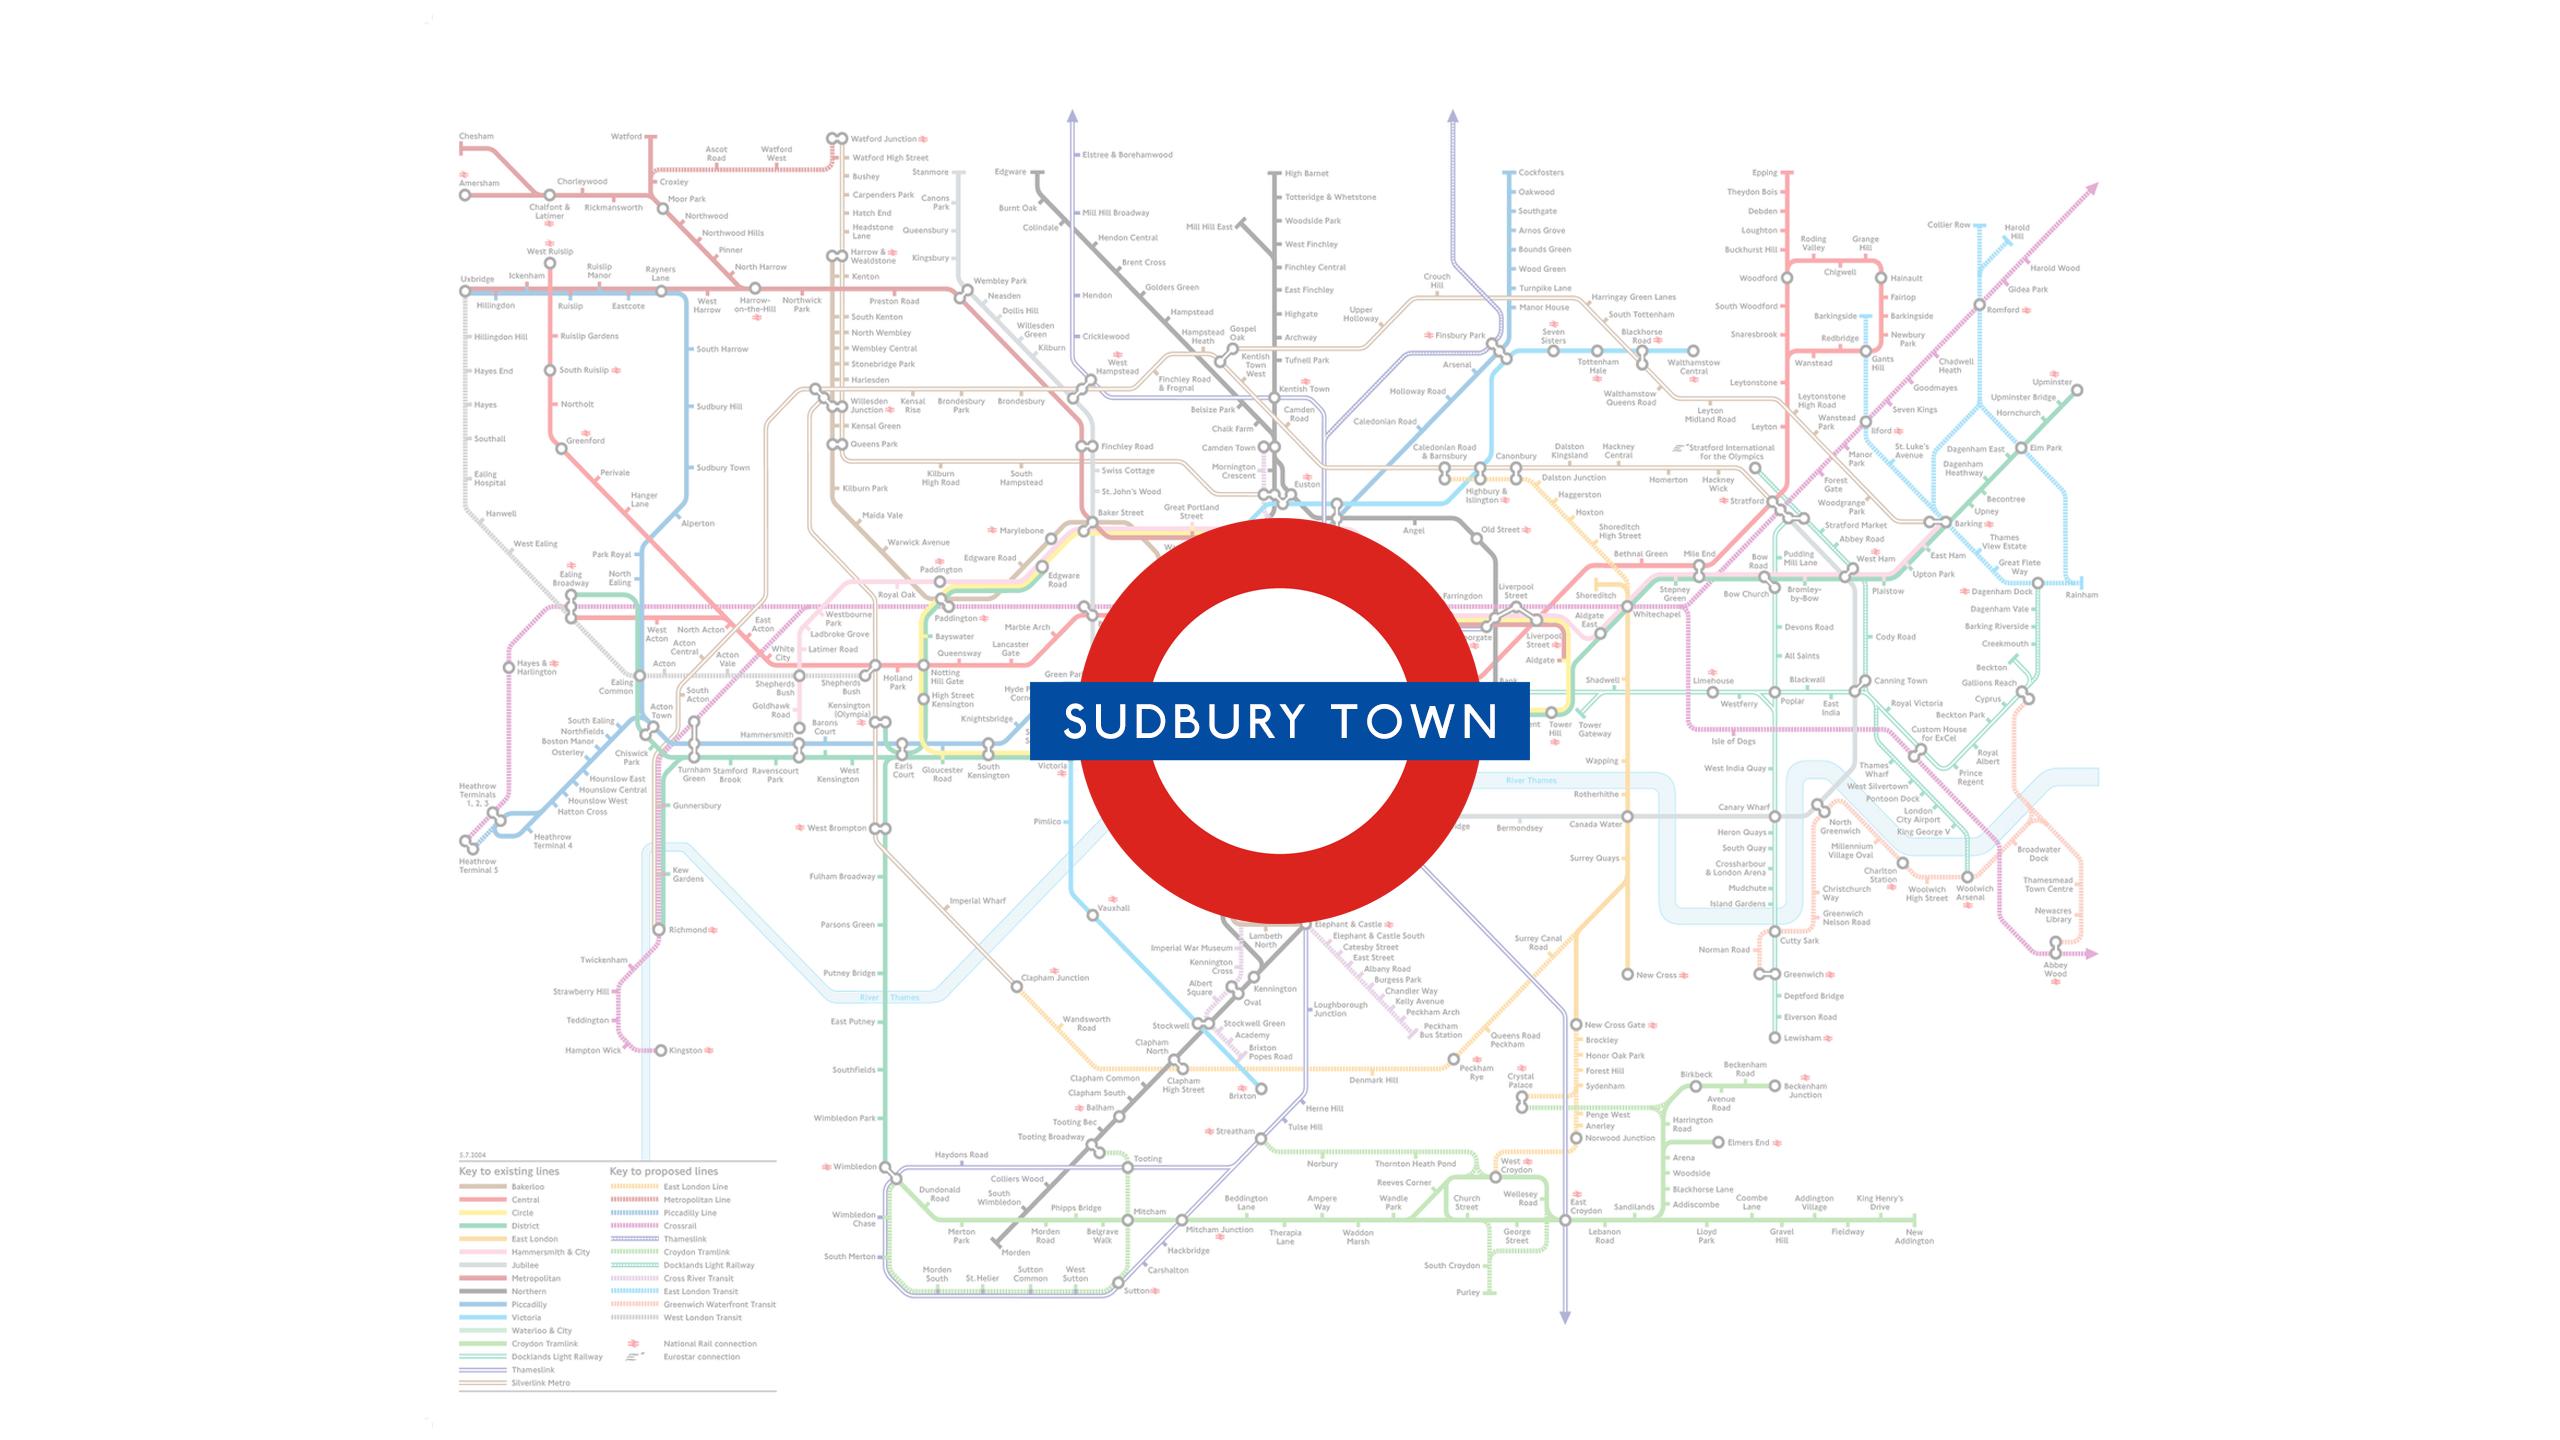 Sudbury Town (Map)